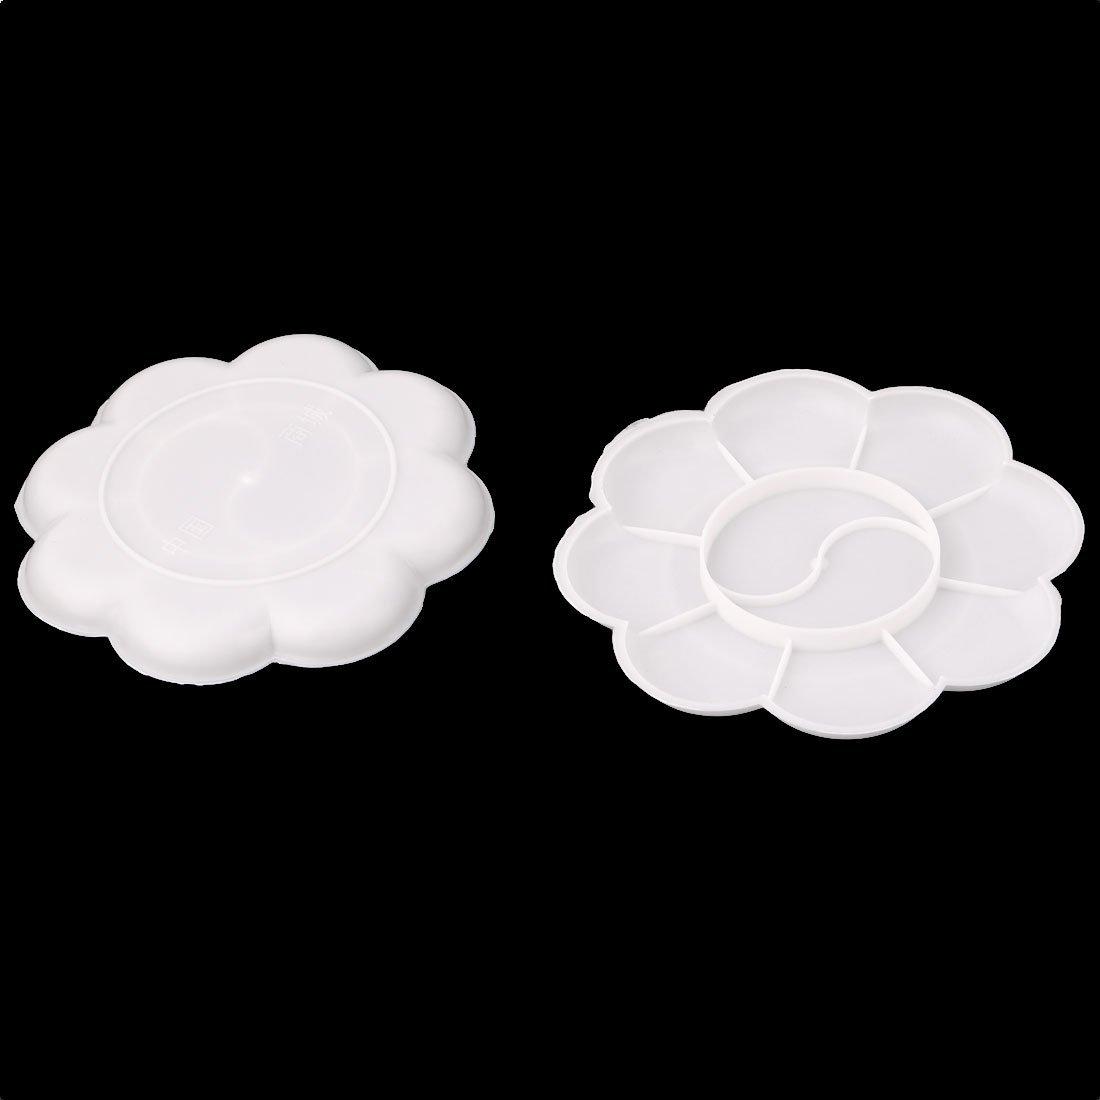 Amazon.com: DealMux Artistas Plásticos 10 Bem pintura Paleta bandejas Placa 5 Pcs Branco: Home & Kitchen